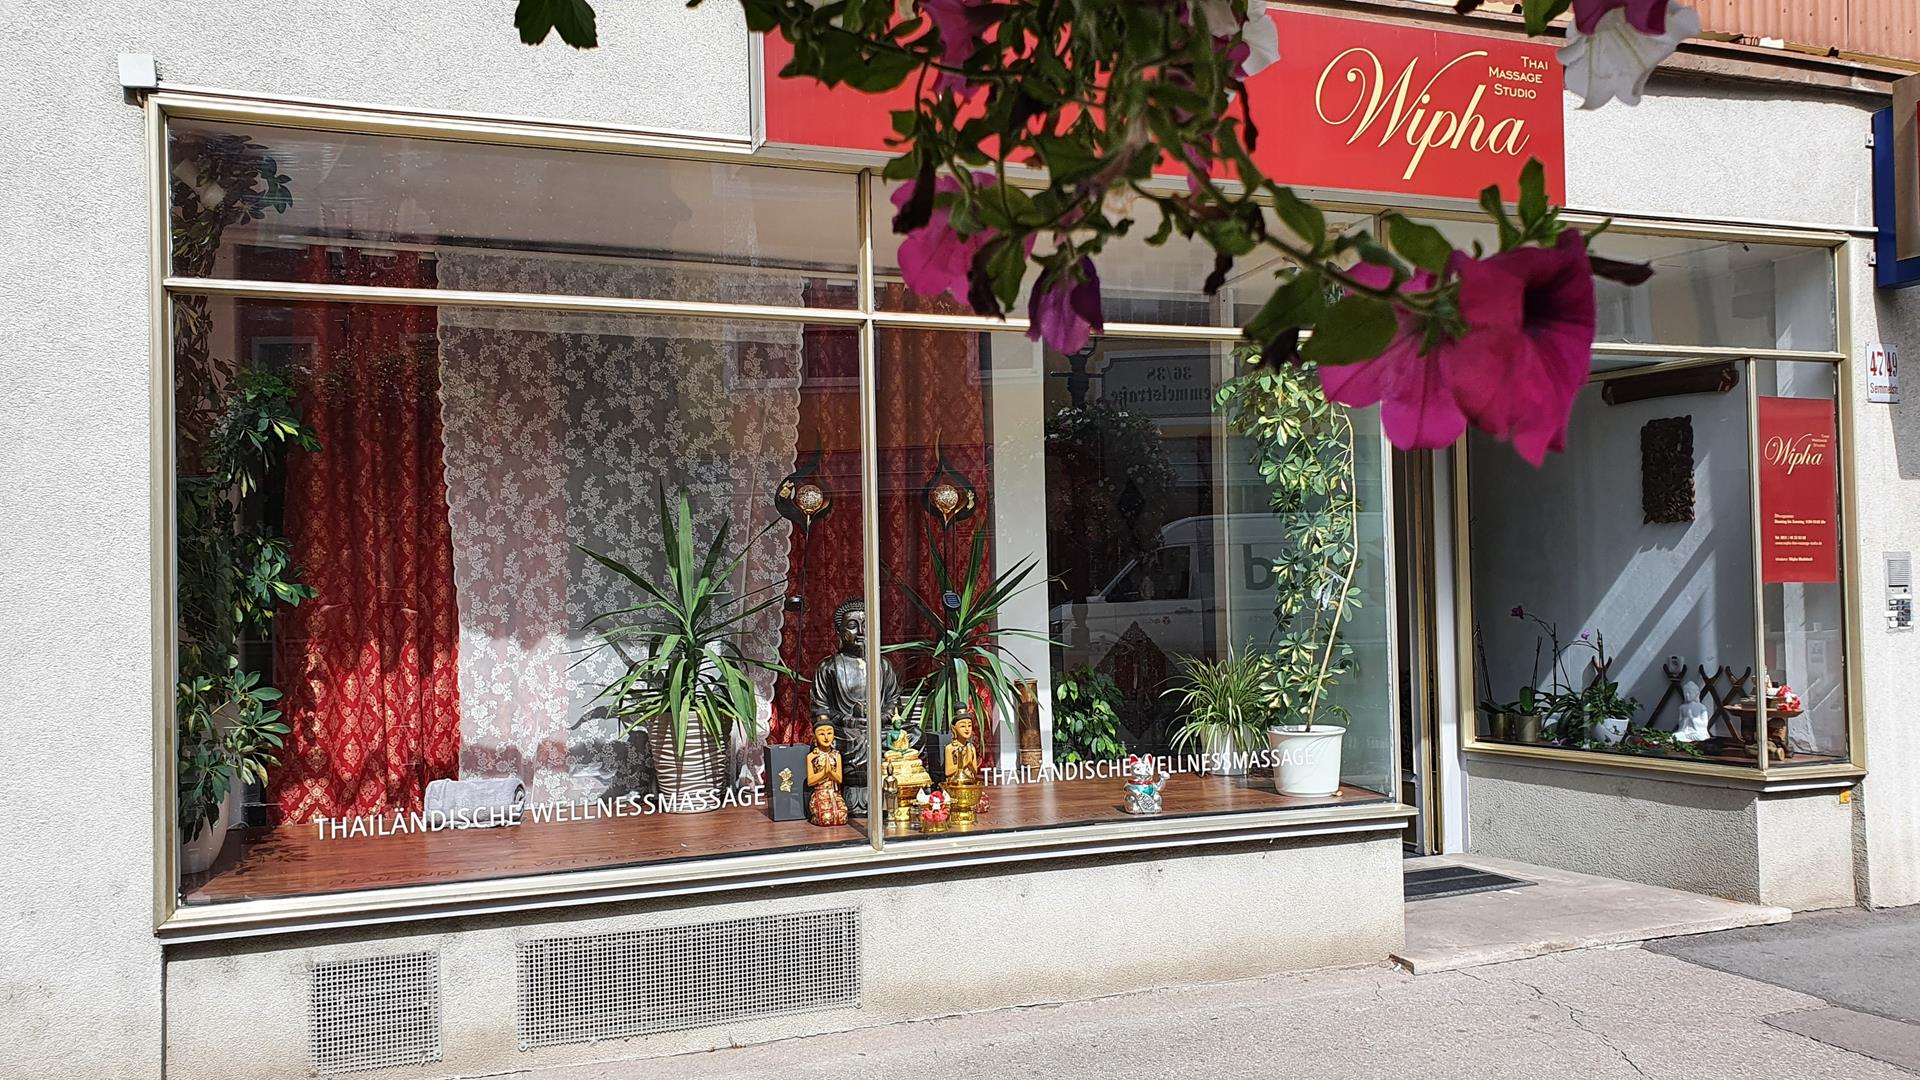 Wipha Thai Massage Studio in der Würzburger Innenstadt, Semmelstr. 47-49, direkt am Bäckerbrunnen